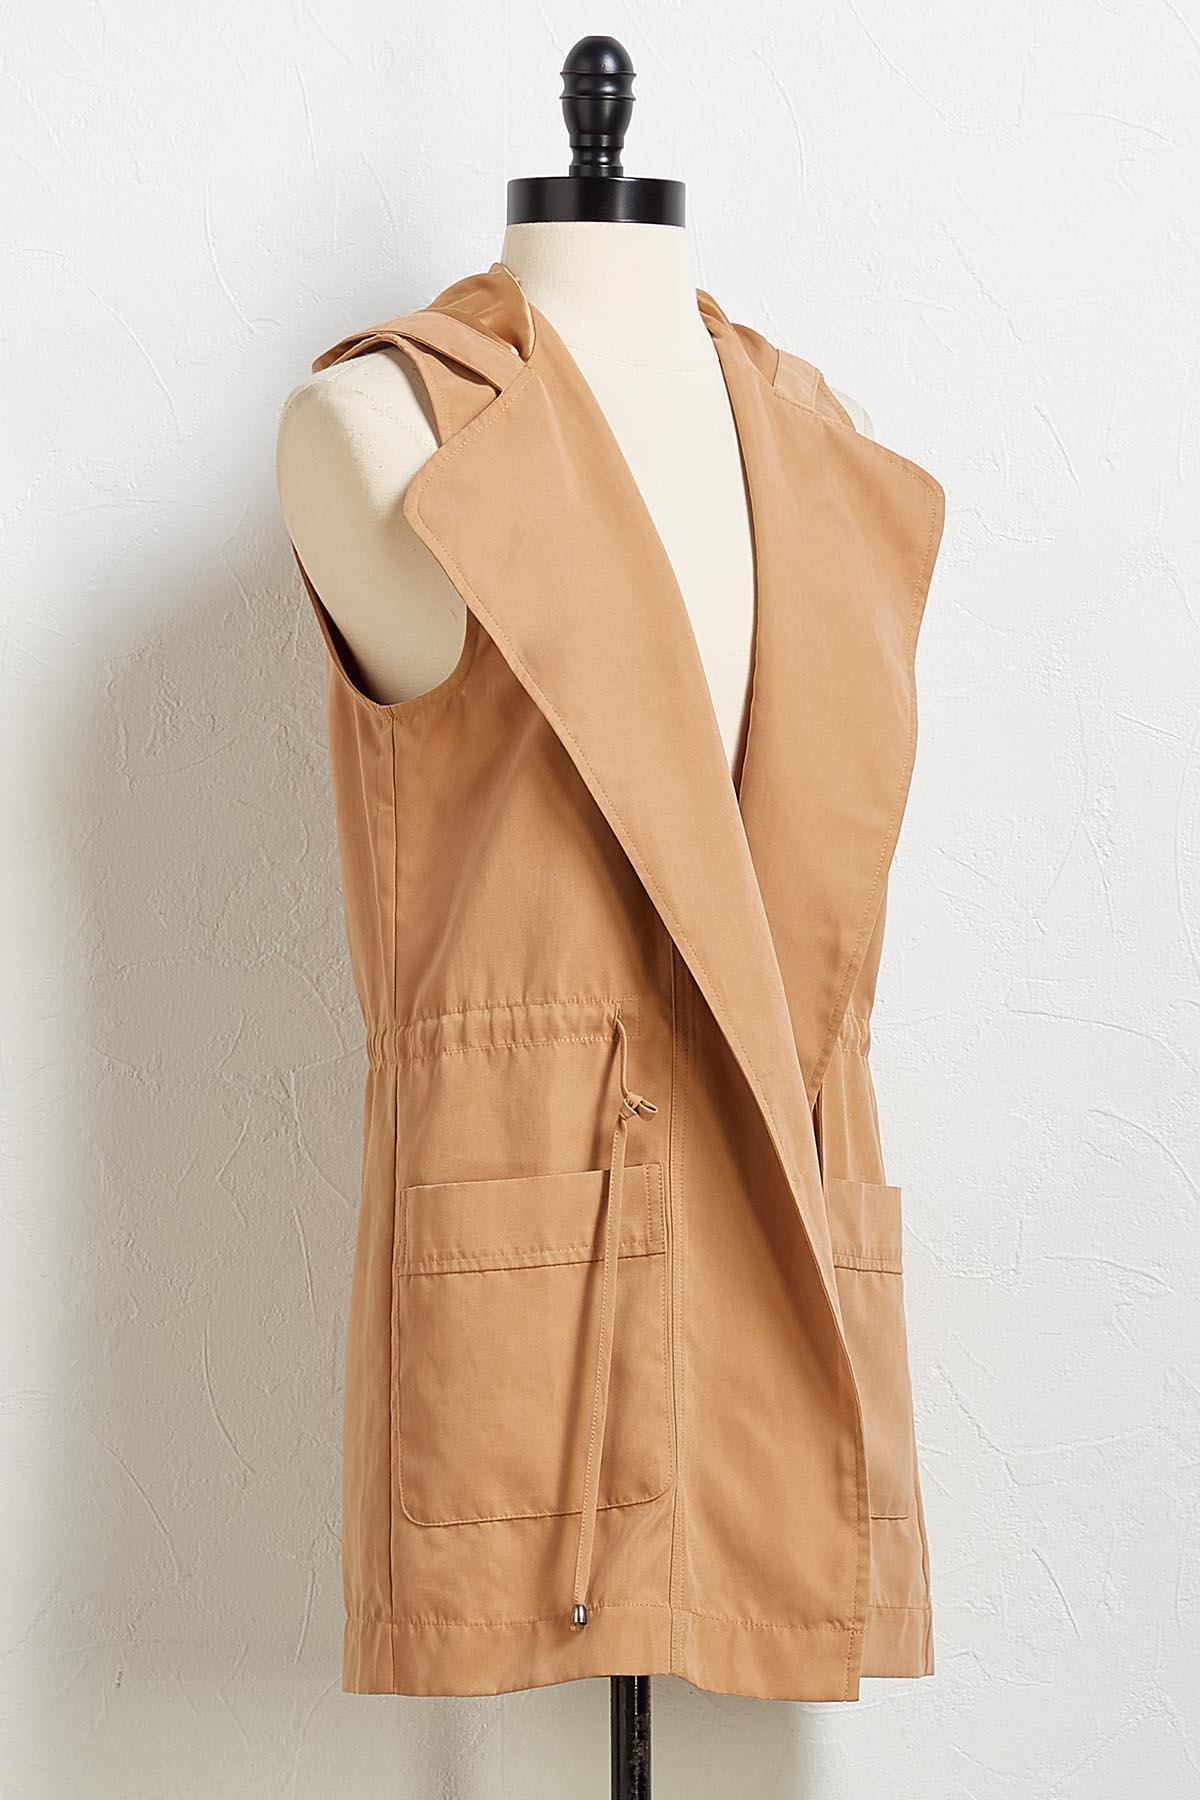 Gold Utility Vest